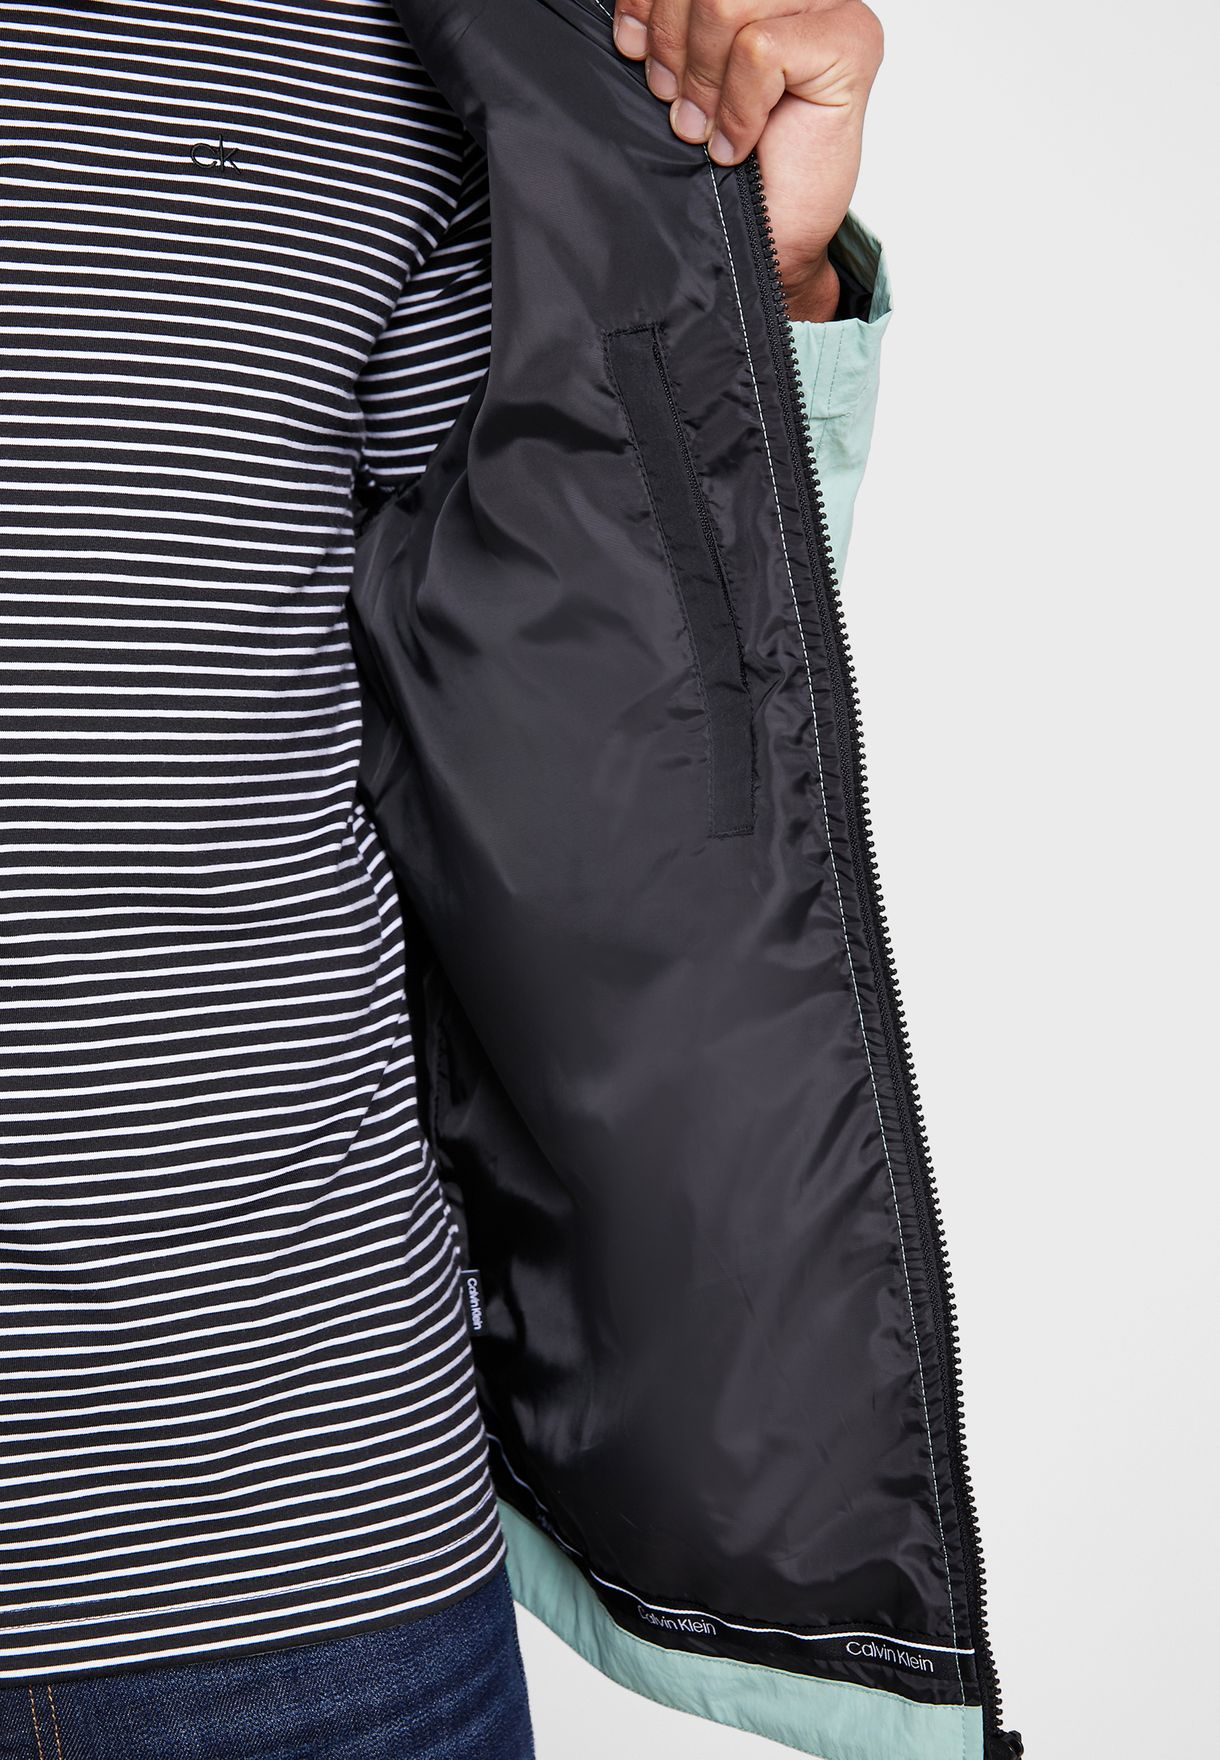 Crinkle Blouson Jacket